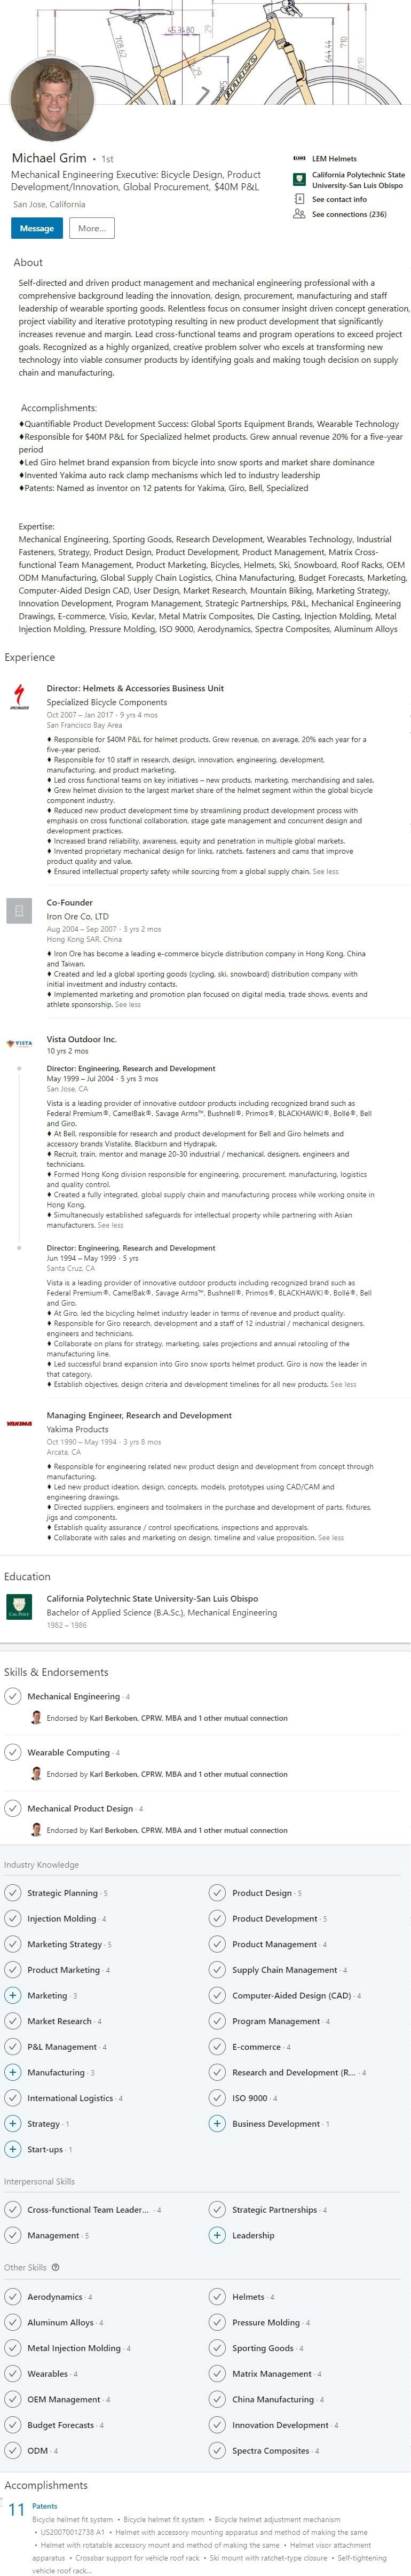 Resume writing service and linkedin